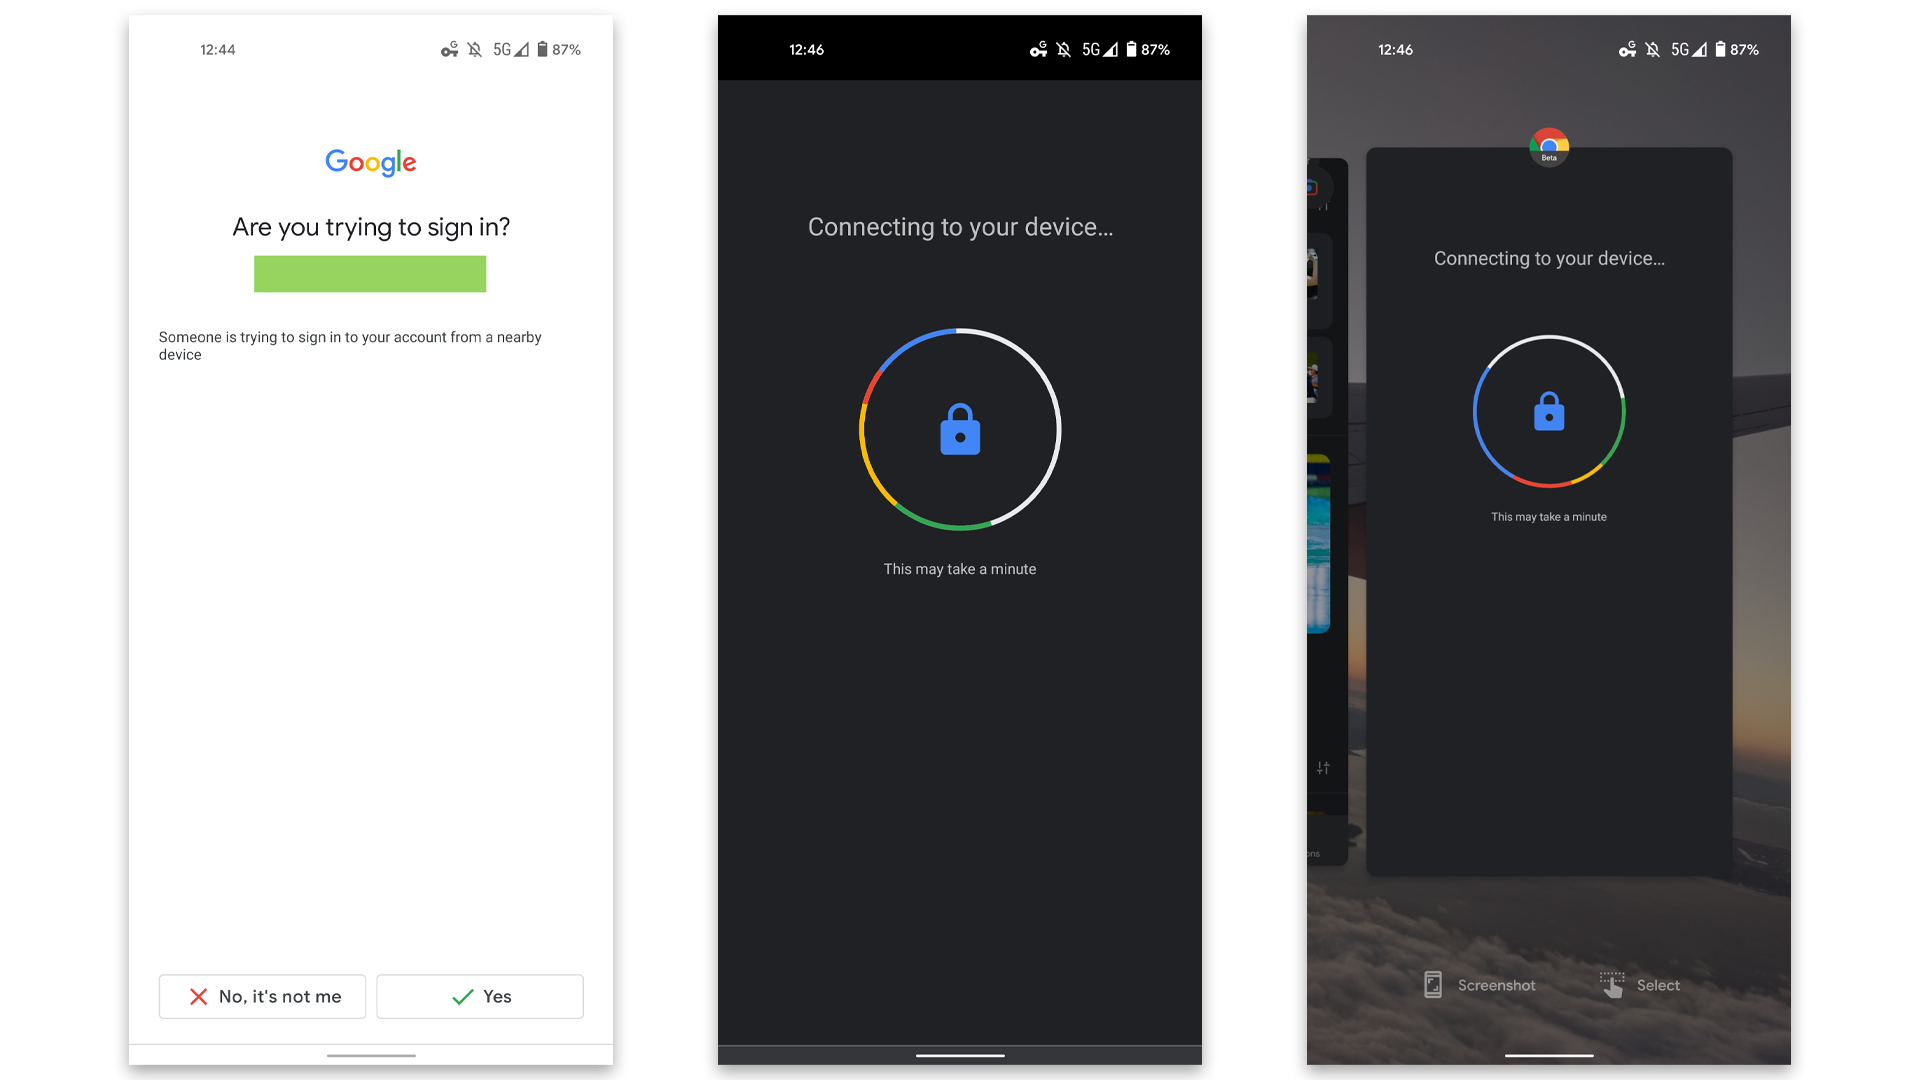 An Android phone using Chrome for 2FA/2SA.